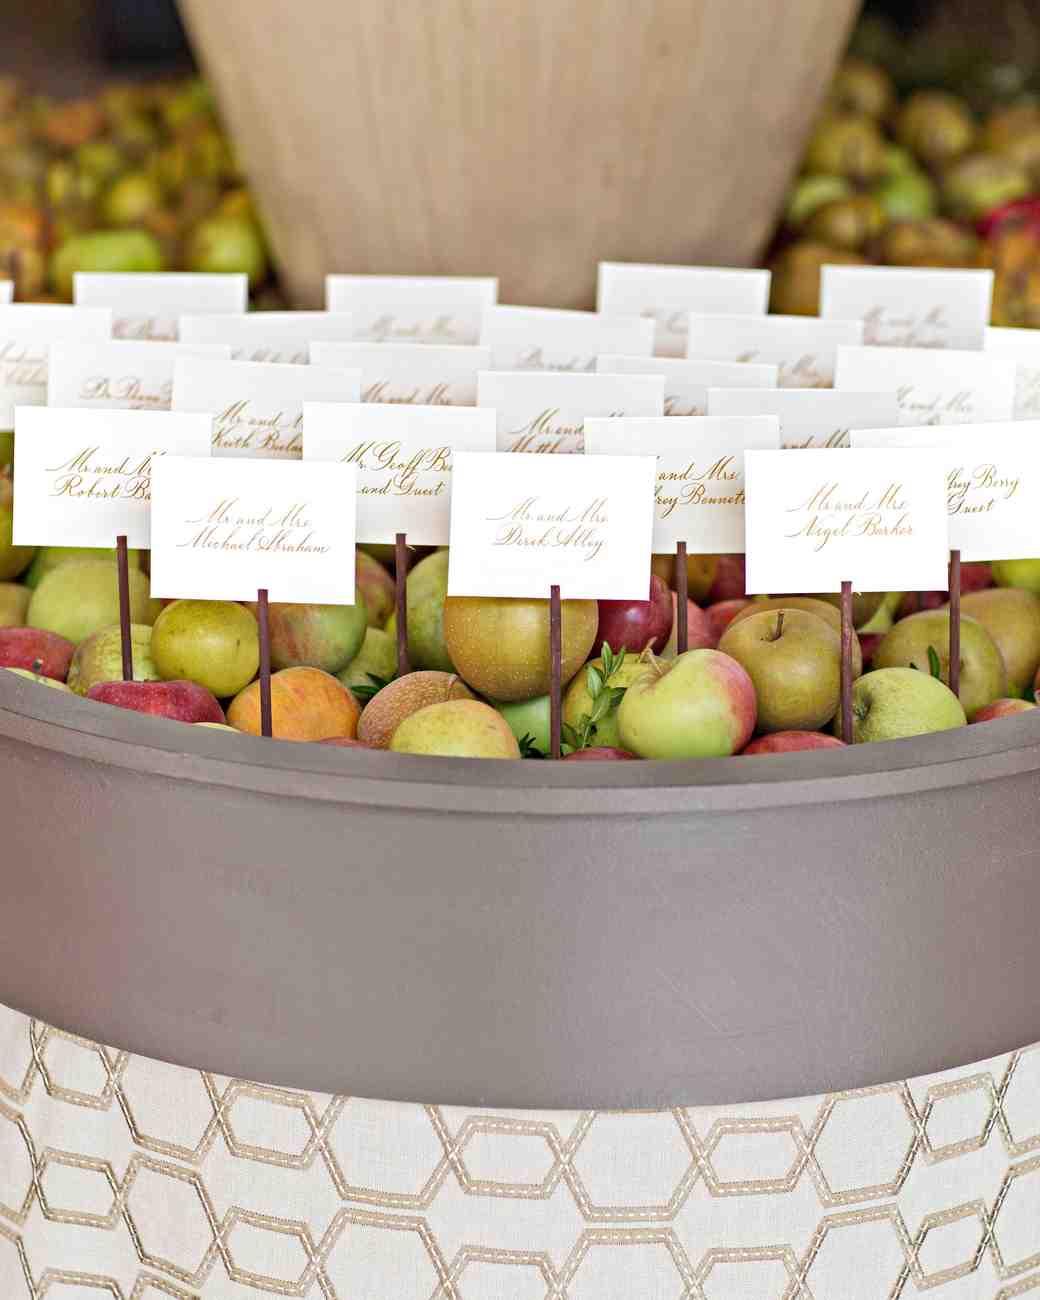 Uncategorized Archives - Chicago Wedding Blog